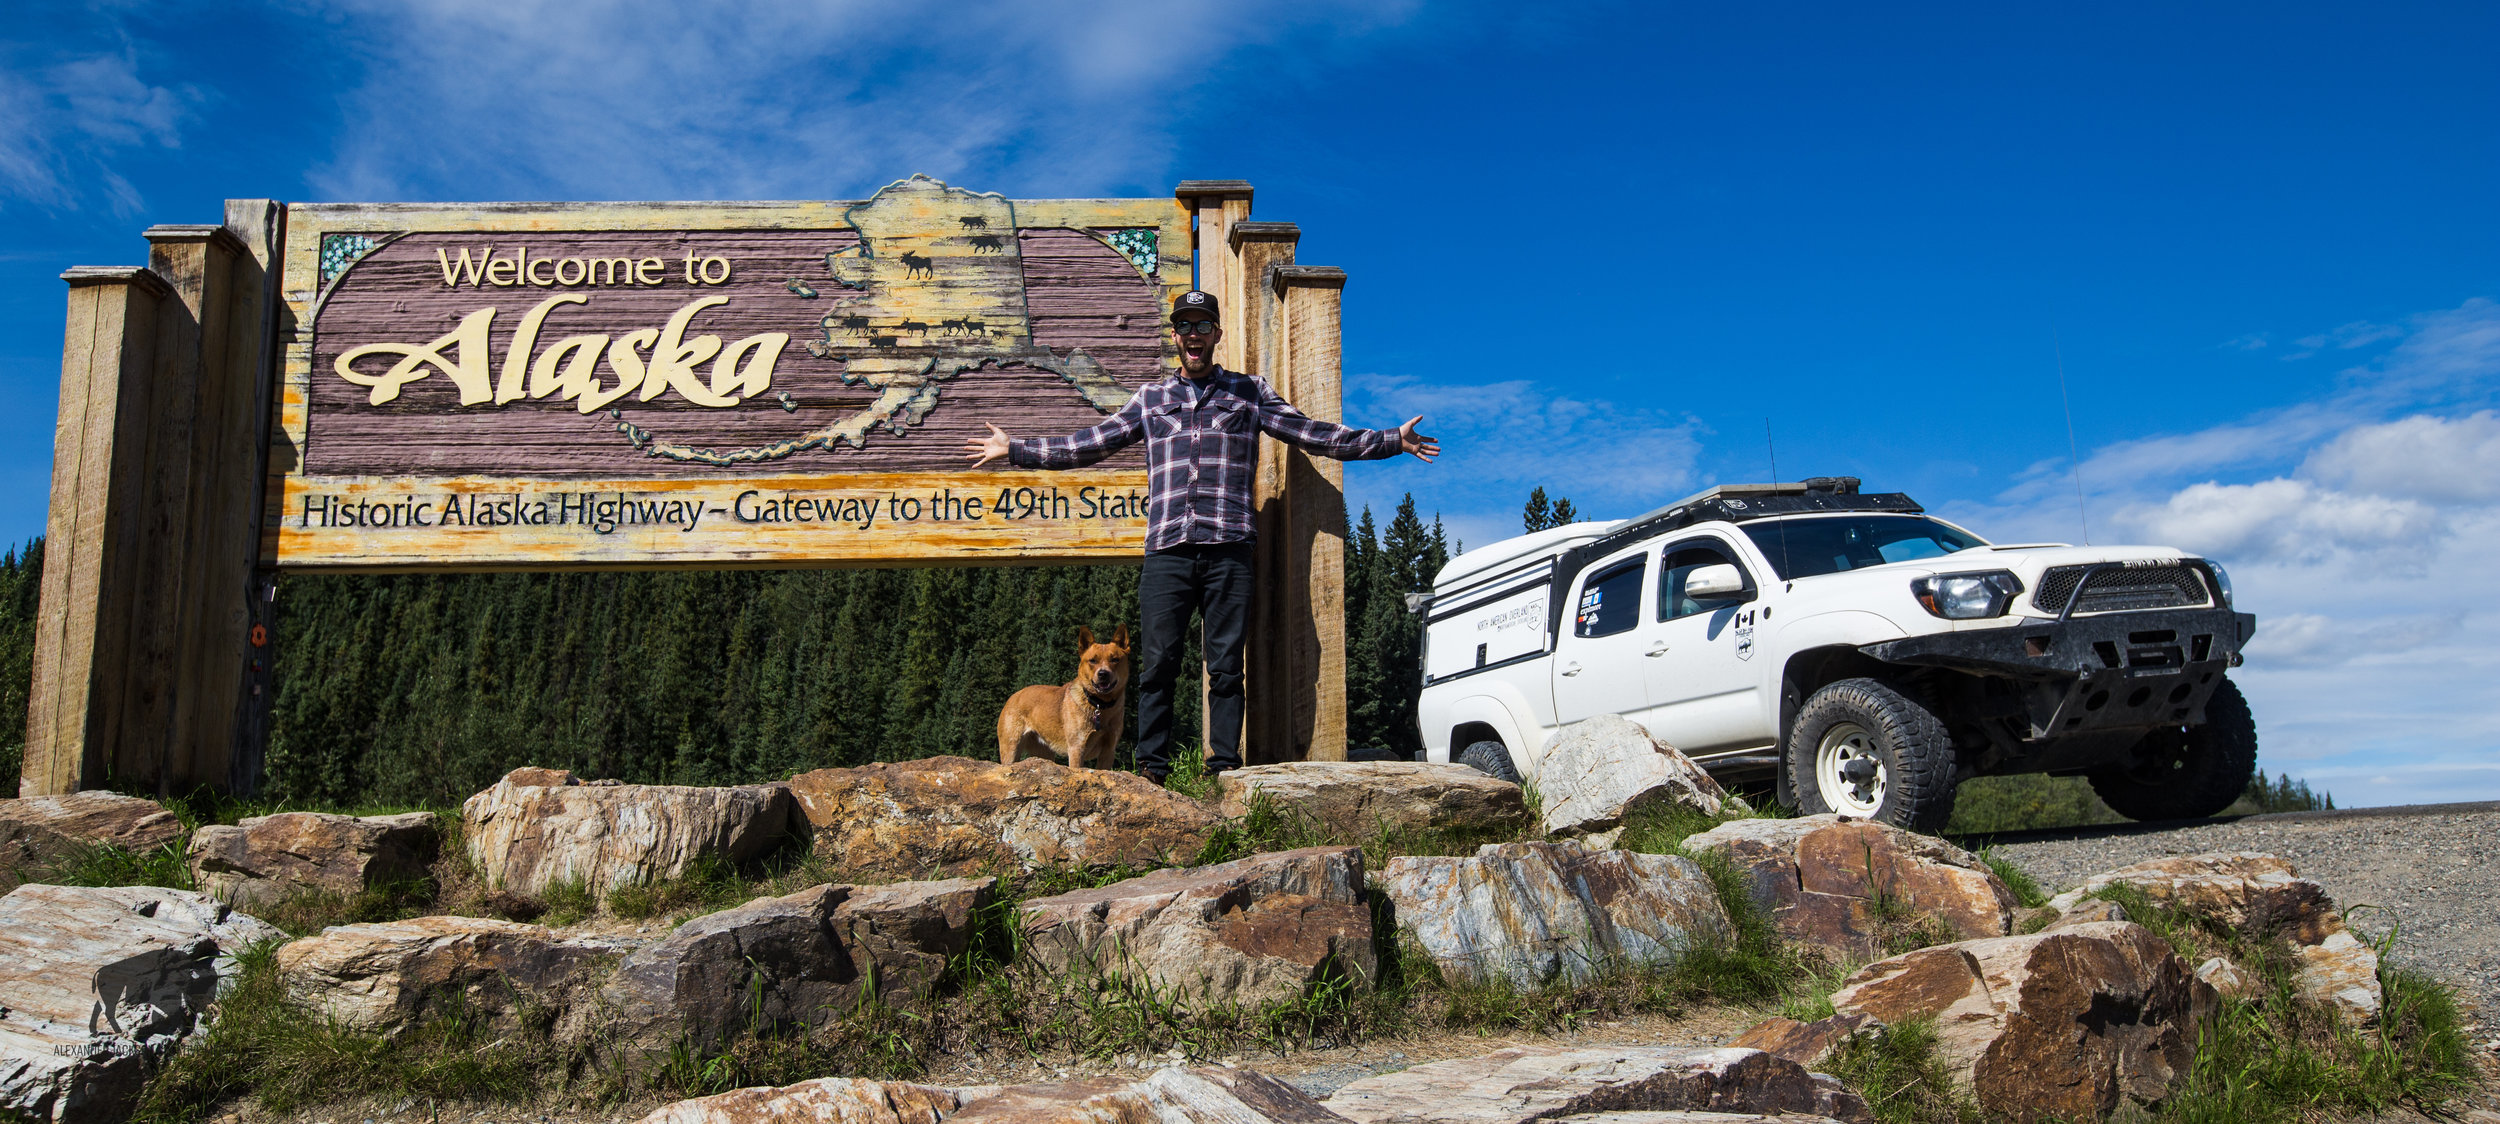 Good bye Alaska! I'll be back one day!